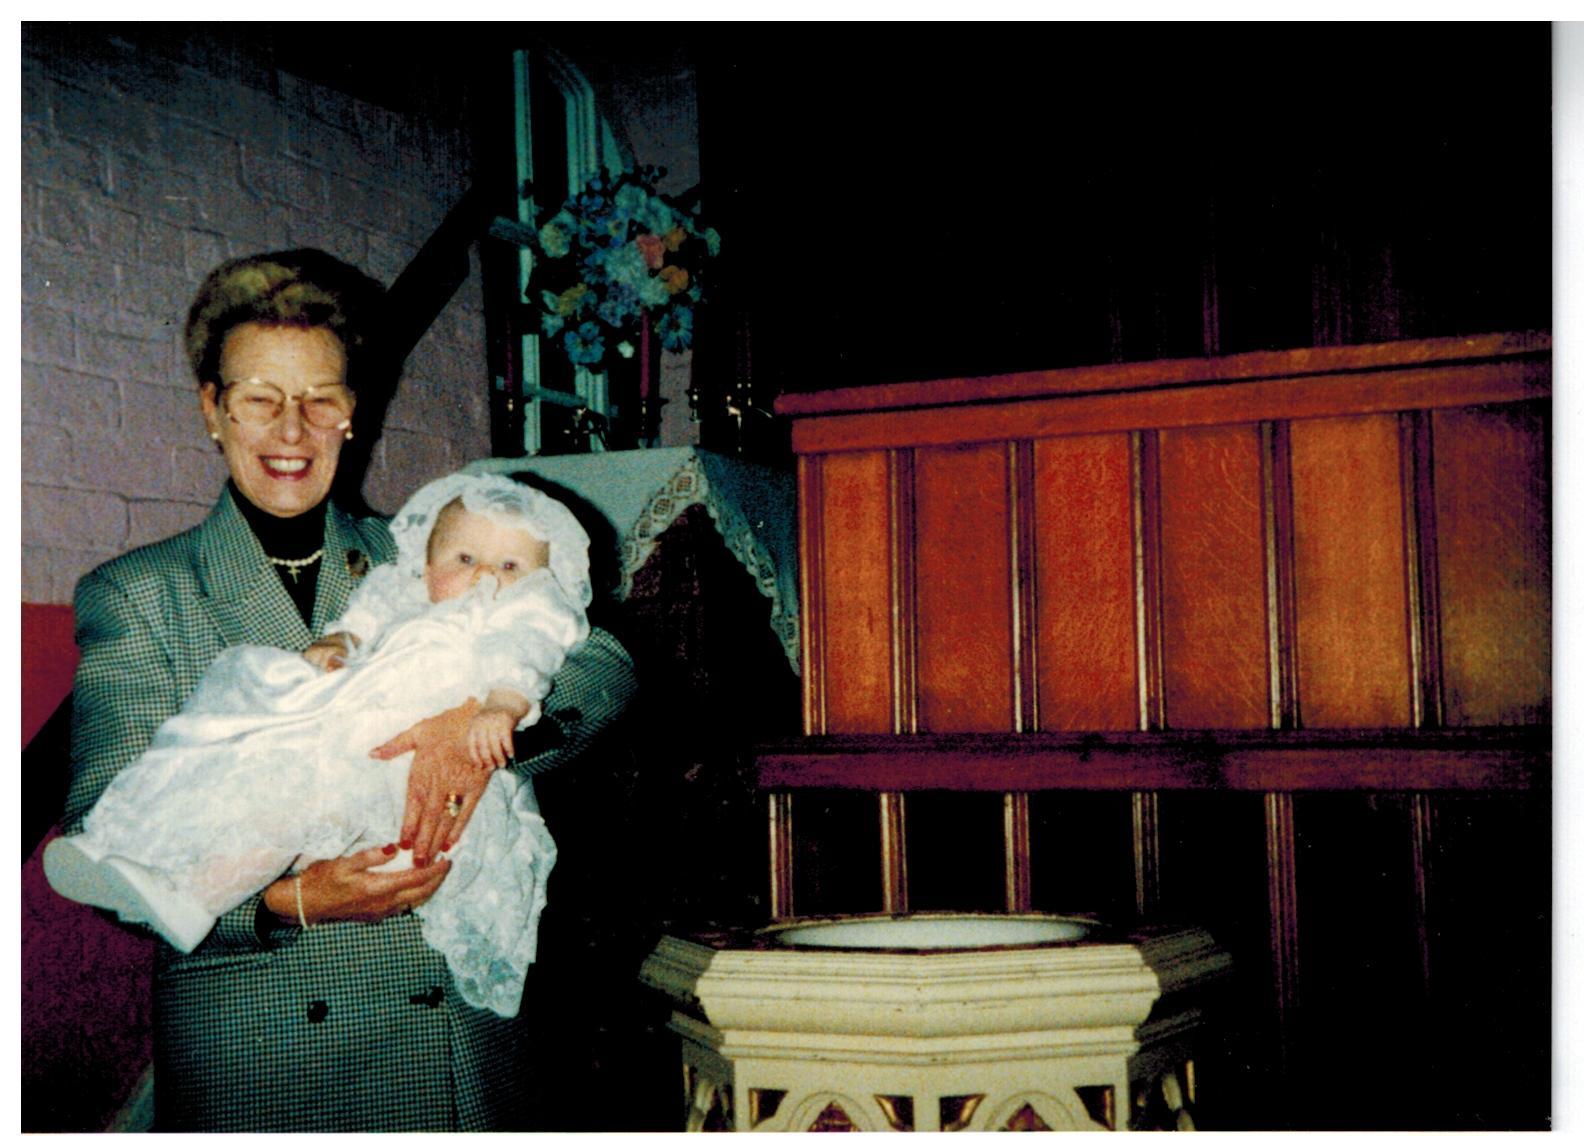 C039 Emma-Ann-COLEY[15-01-95]Brain-Coley-s-grandson